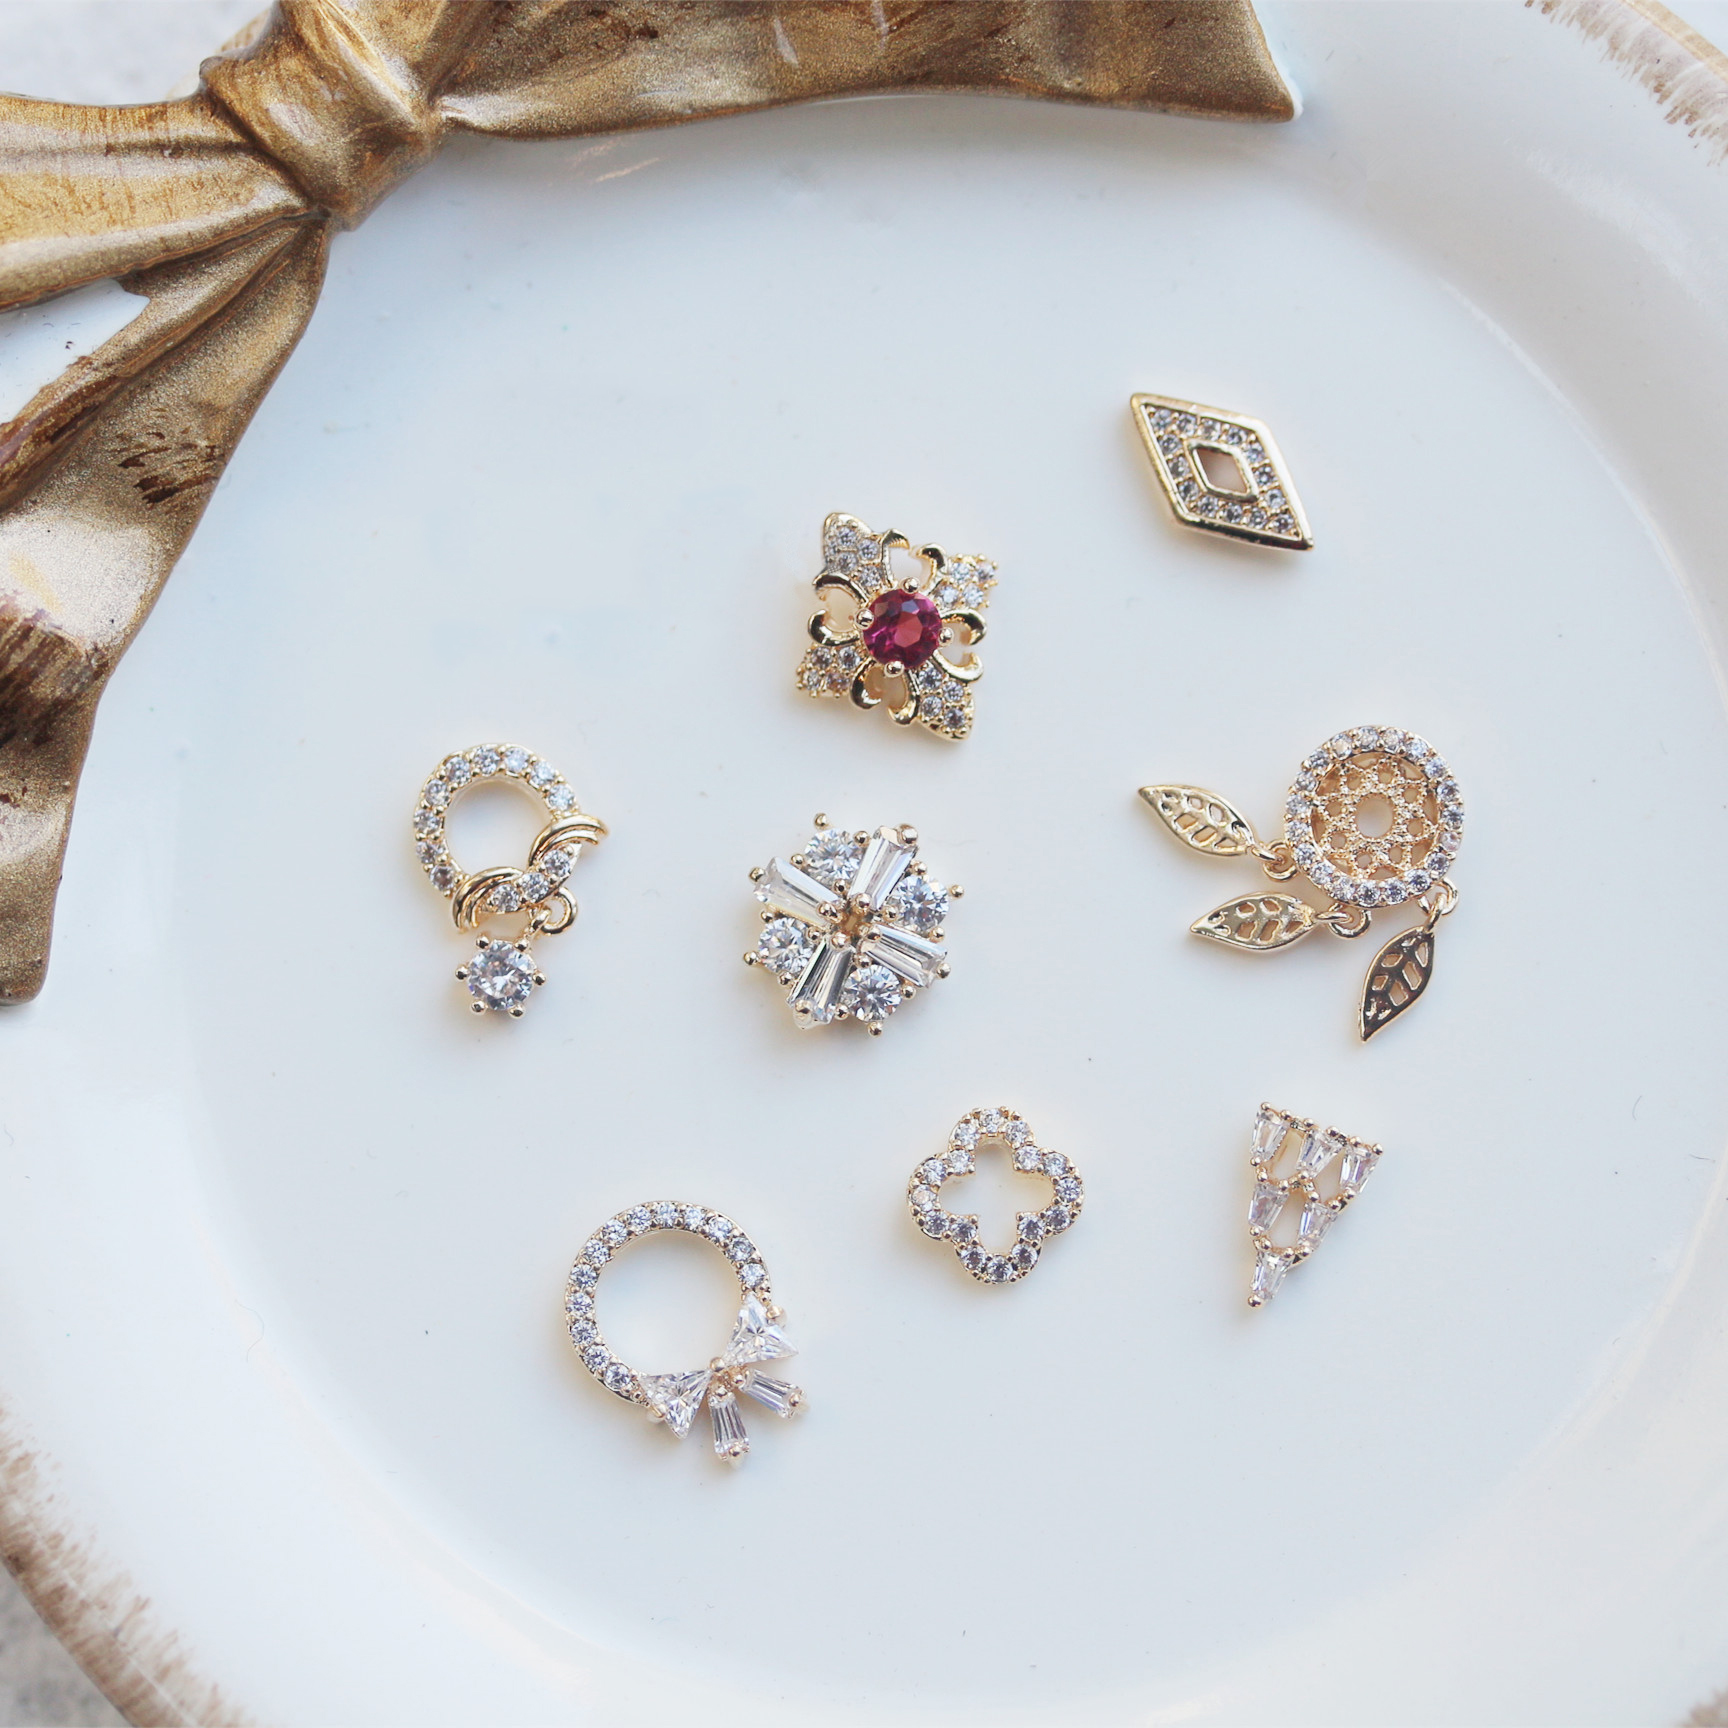 10pcs/lot Ruby Dream Catcher Crystal Zircon Nail Art Rhinestone metal manicure nail accessories DIY Nail Decoration Nails charms